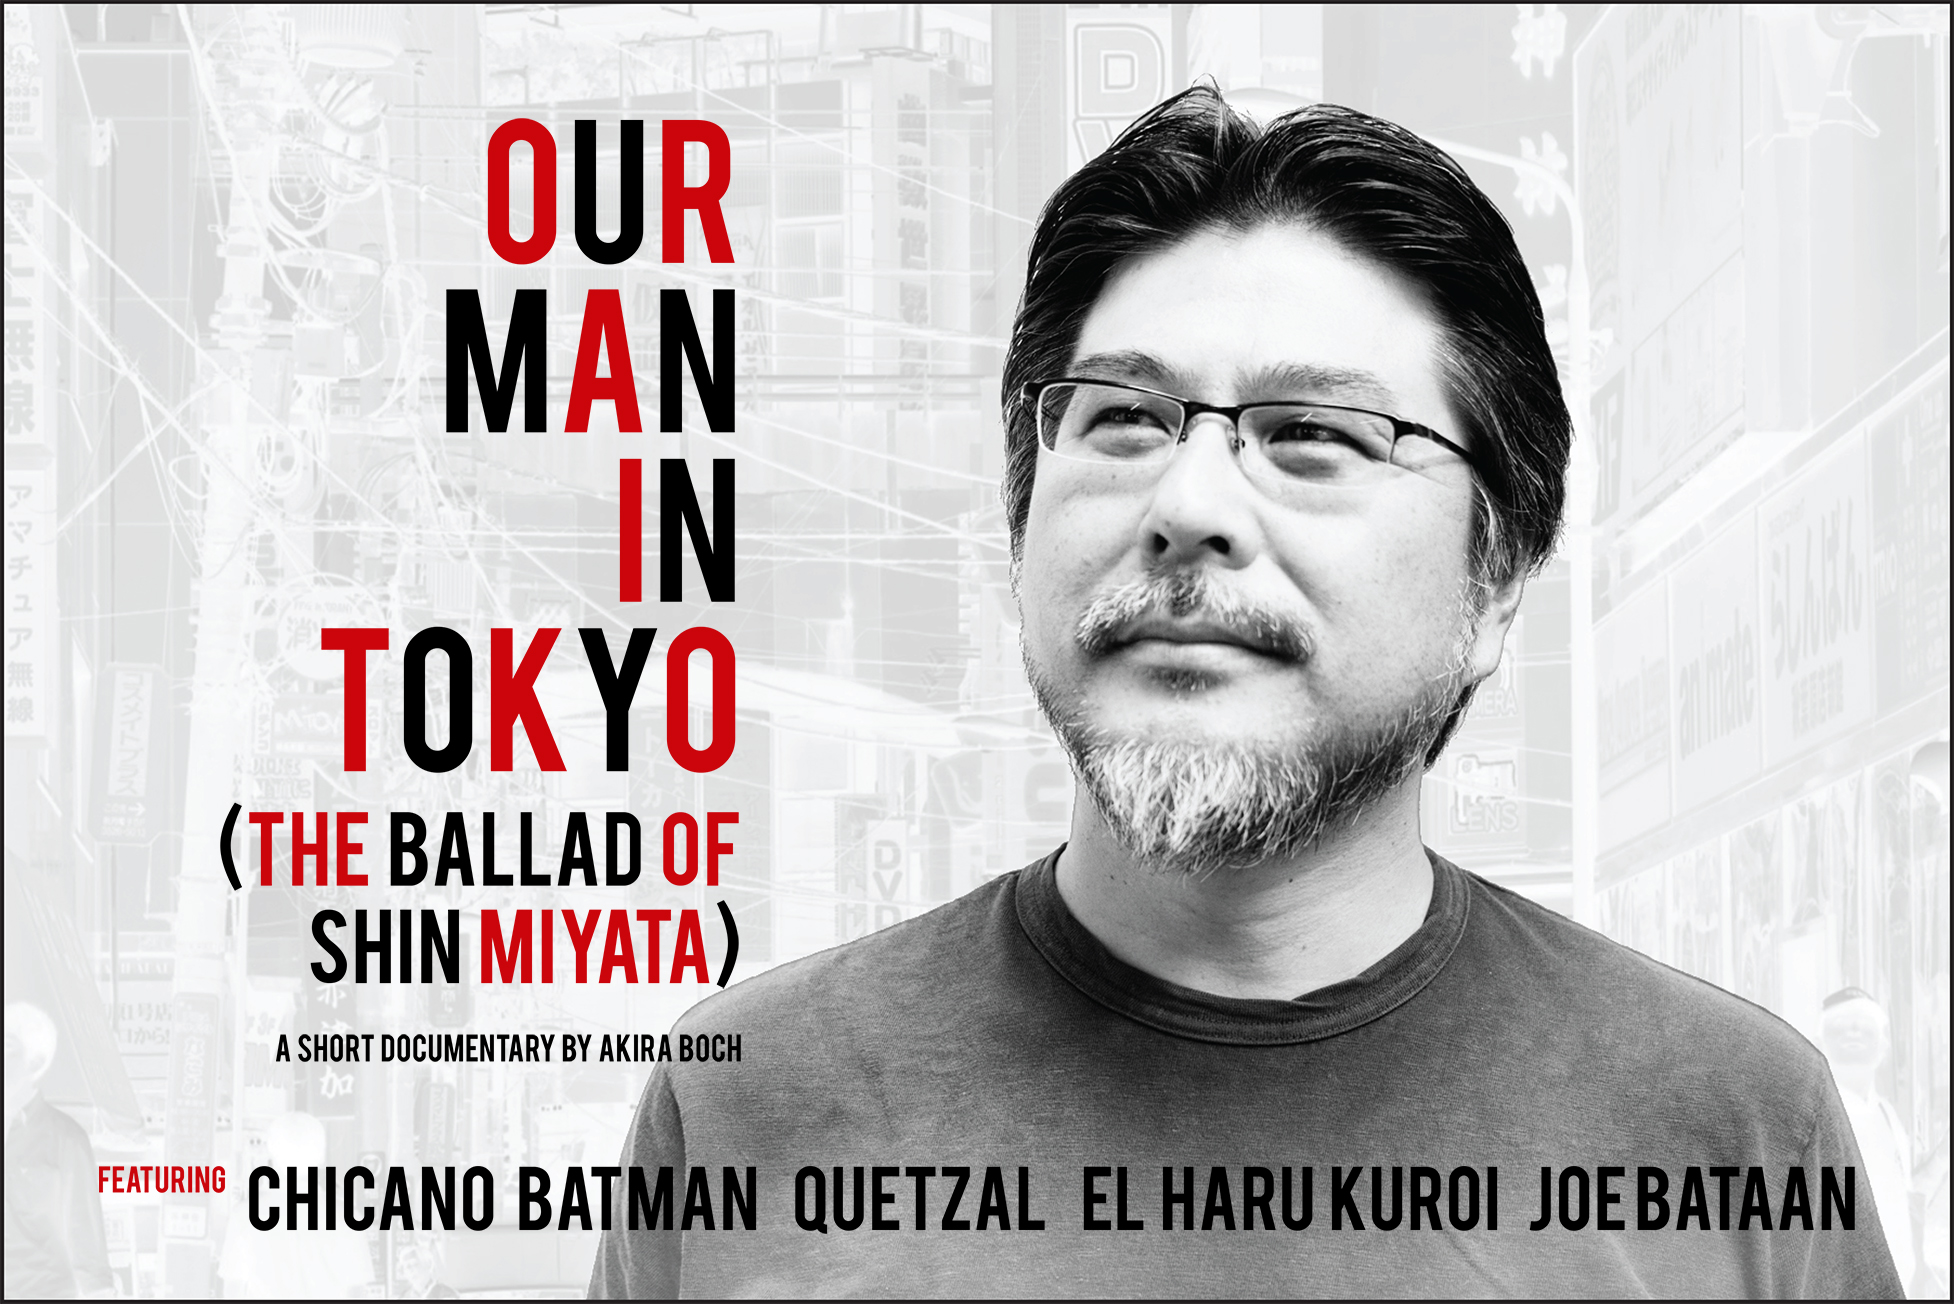 Our Man in Tokyo PROMO IMAGE.jpg